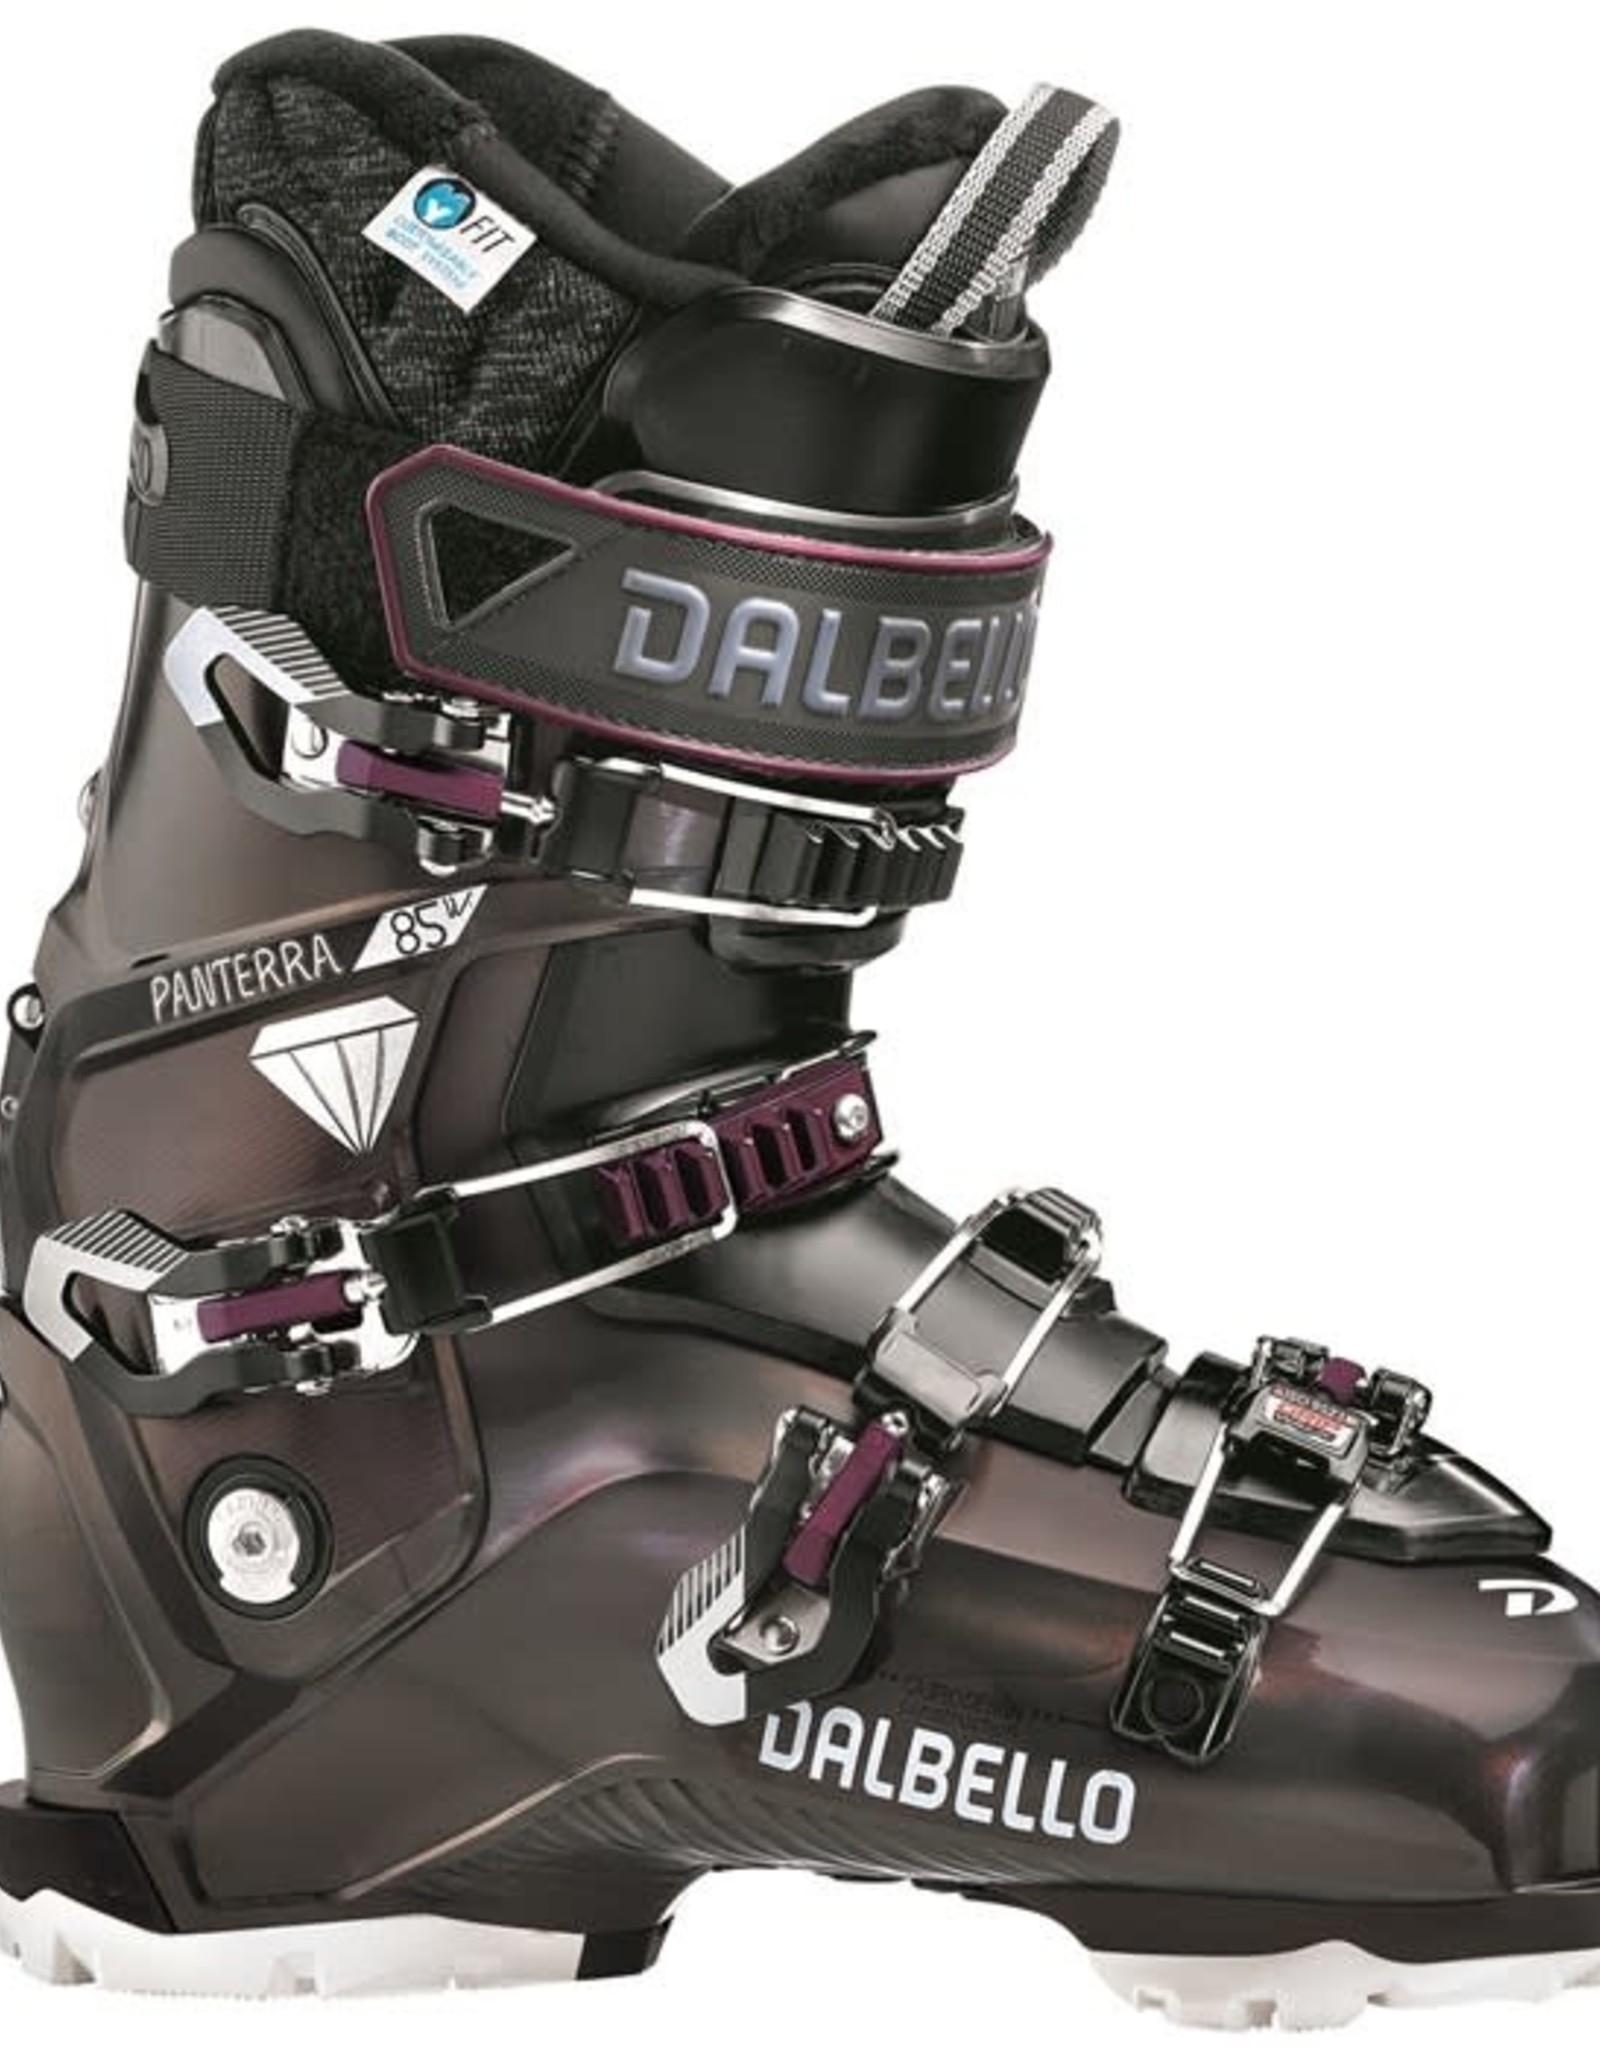 Dalbello Panterra 85 GW LS